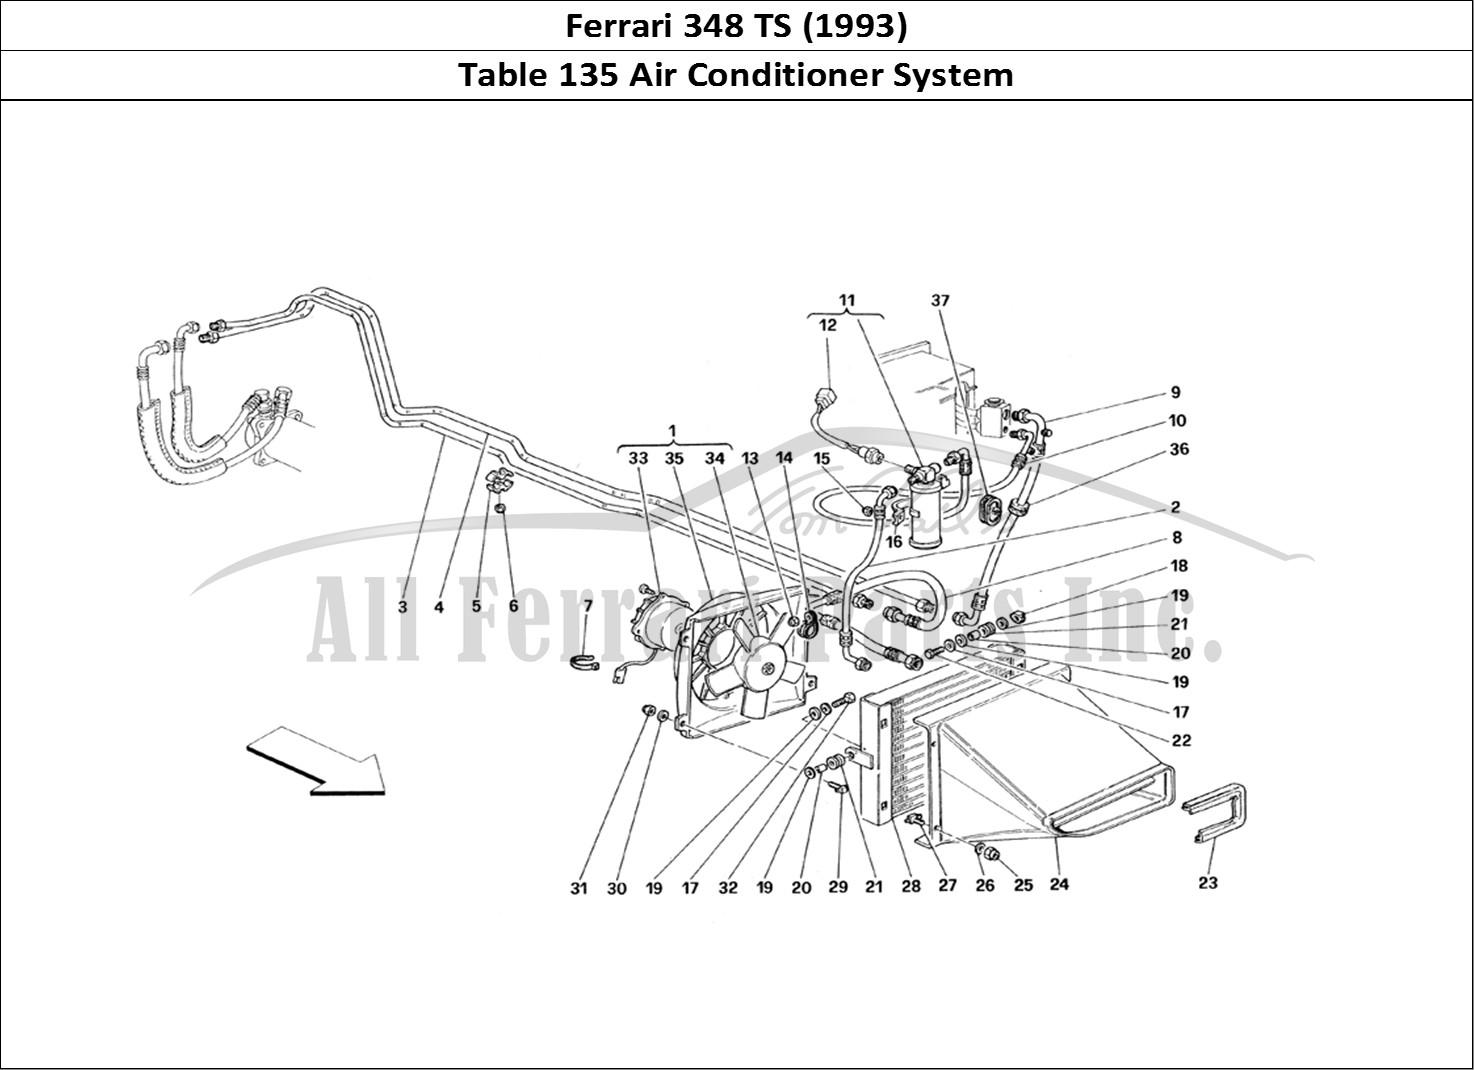 Buy Original Ferrari 348 Ts 135 Air Conditioner